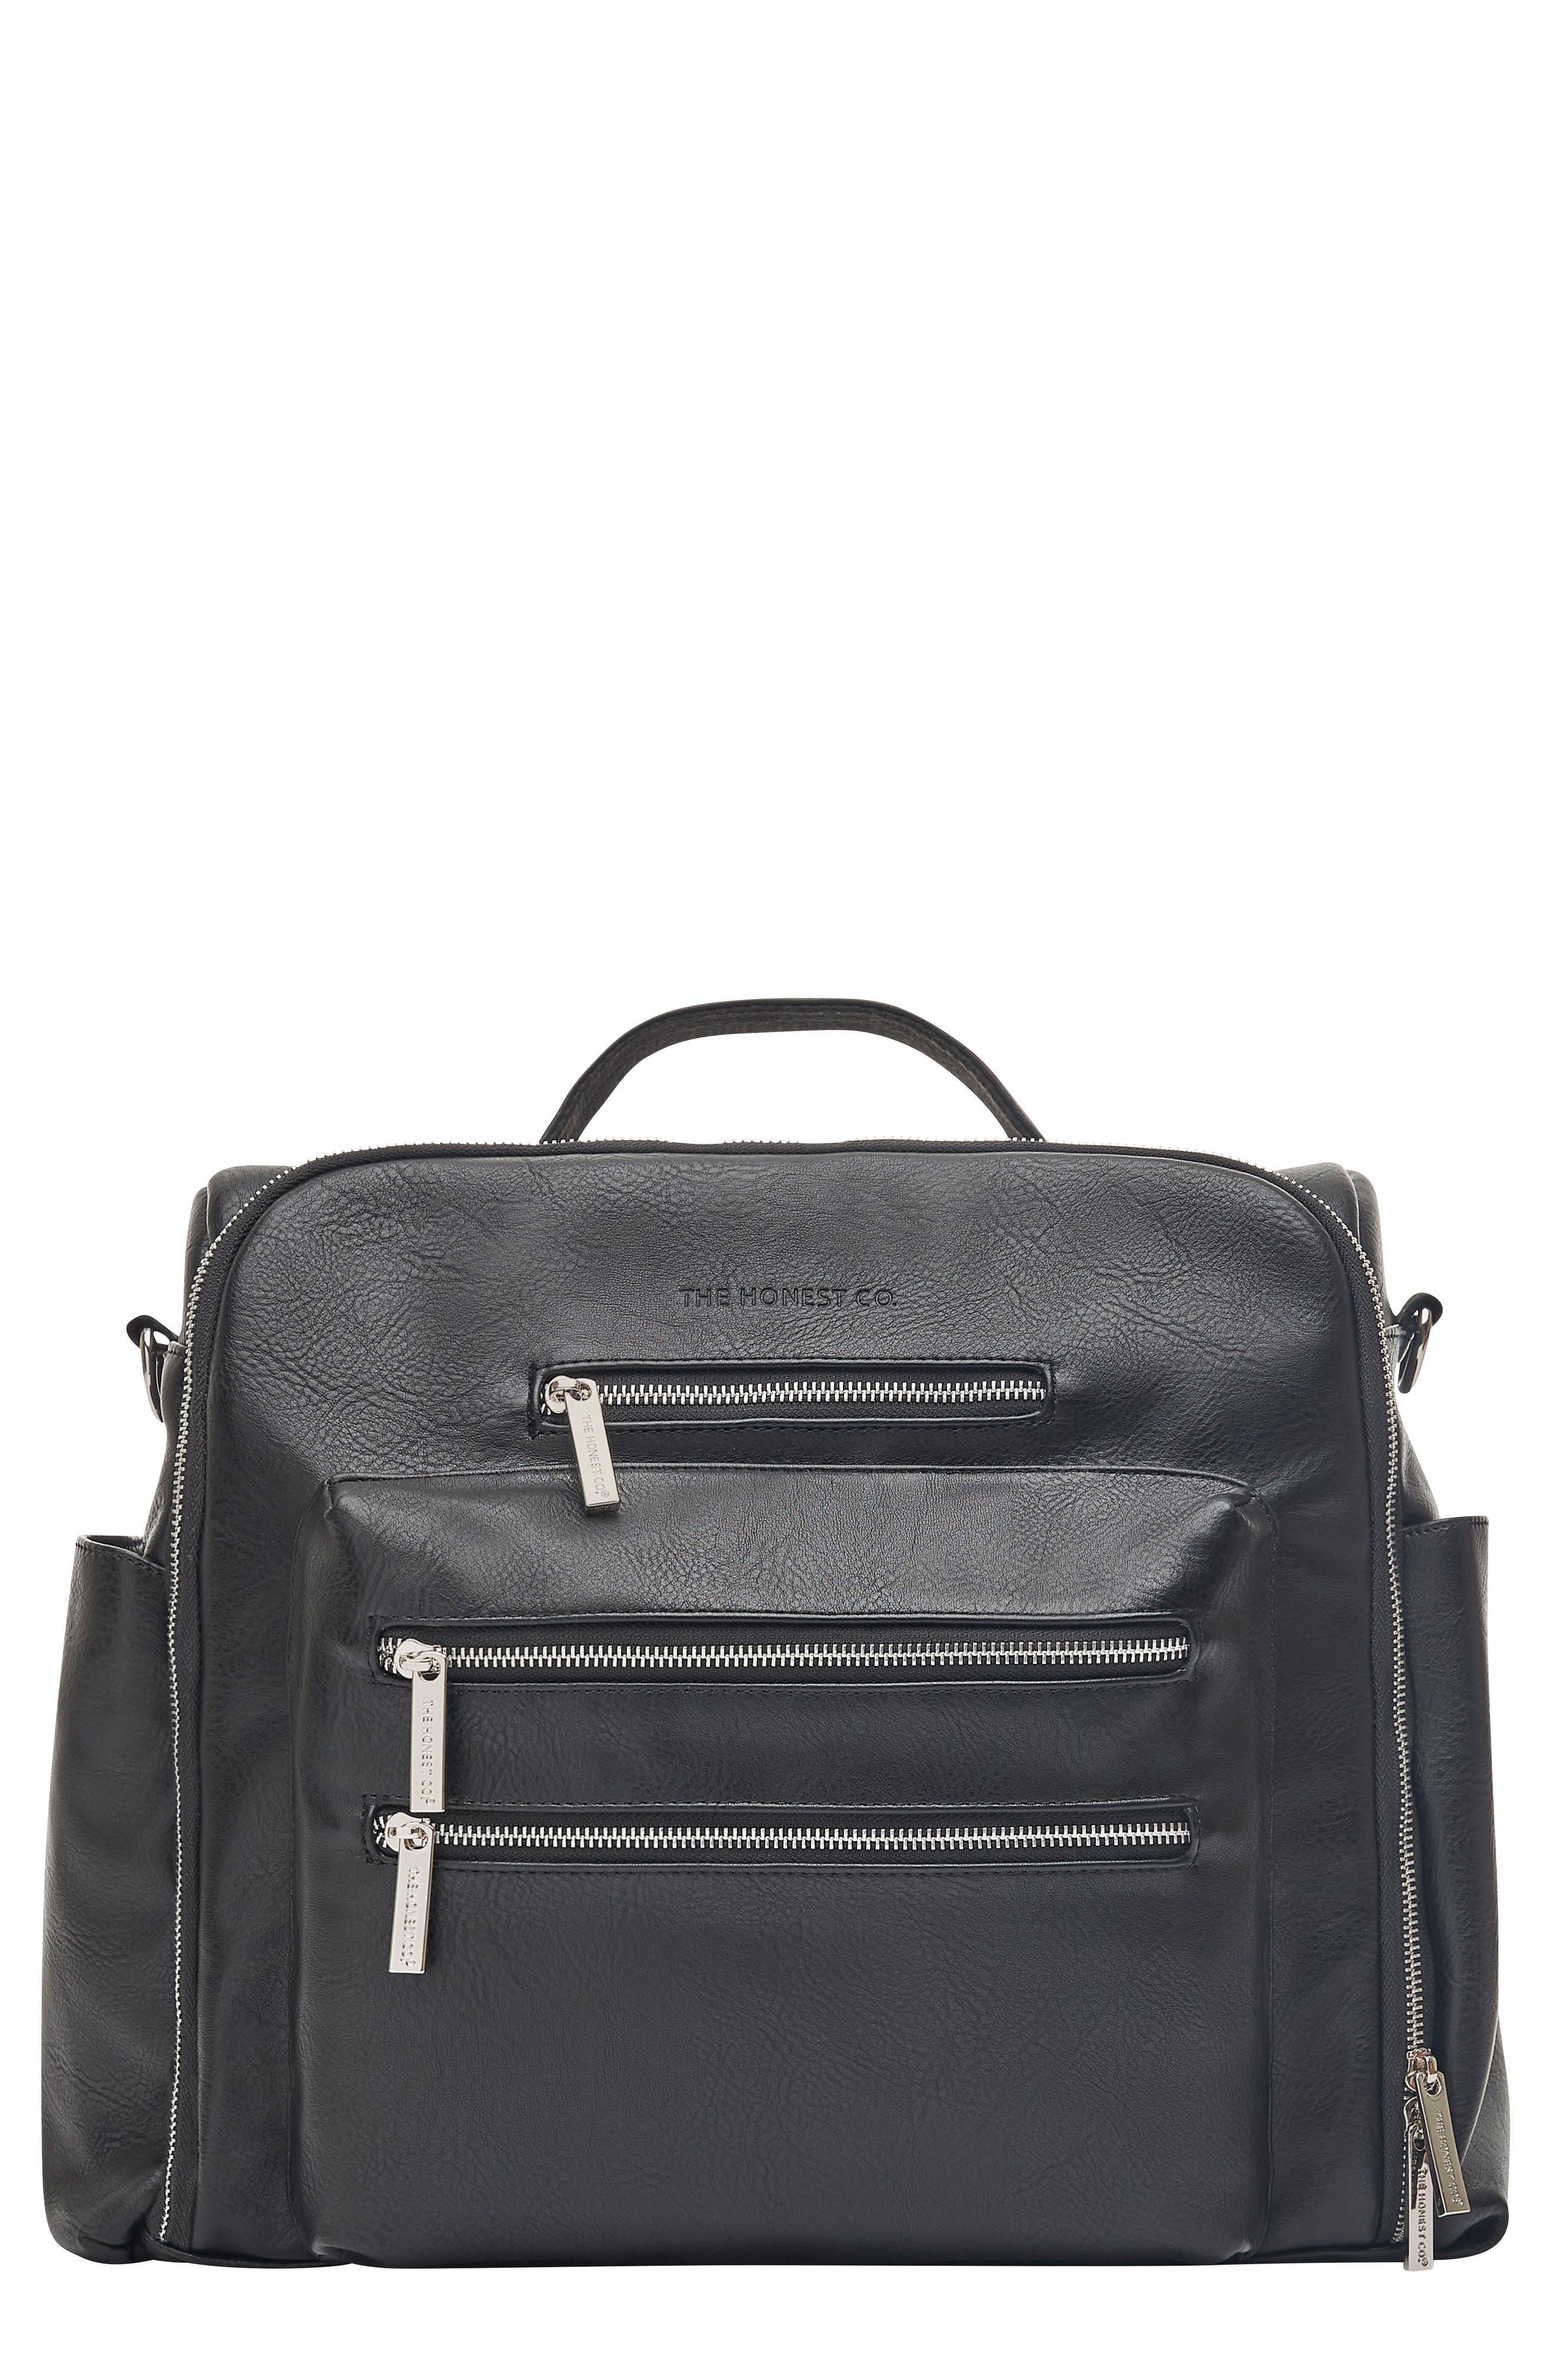 Cross Country Faux Leather Diaper Bag,                             Main thumbnail 1, color,                             BLACK